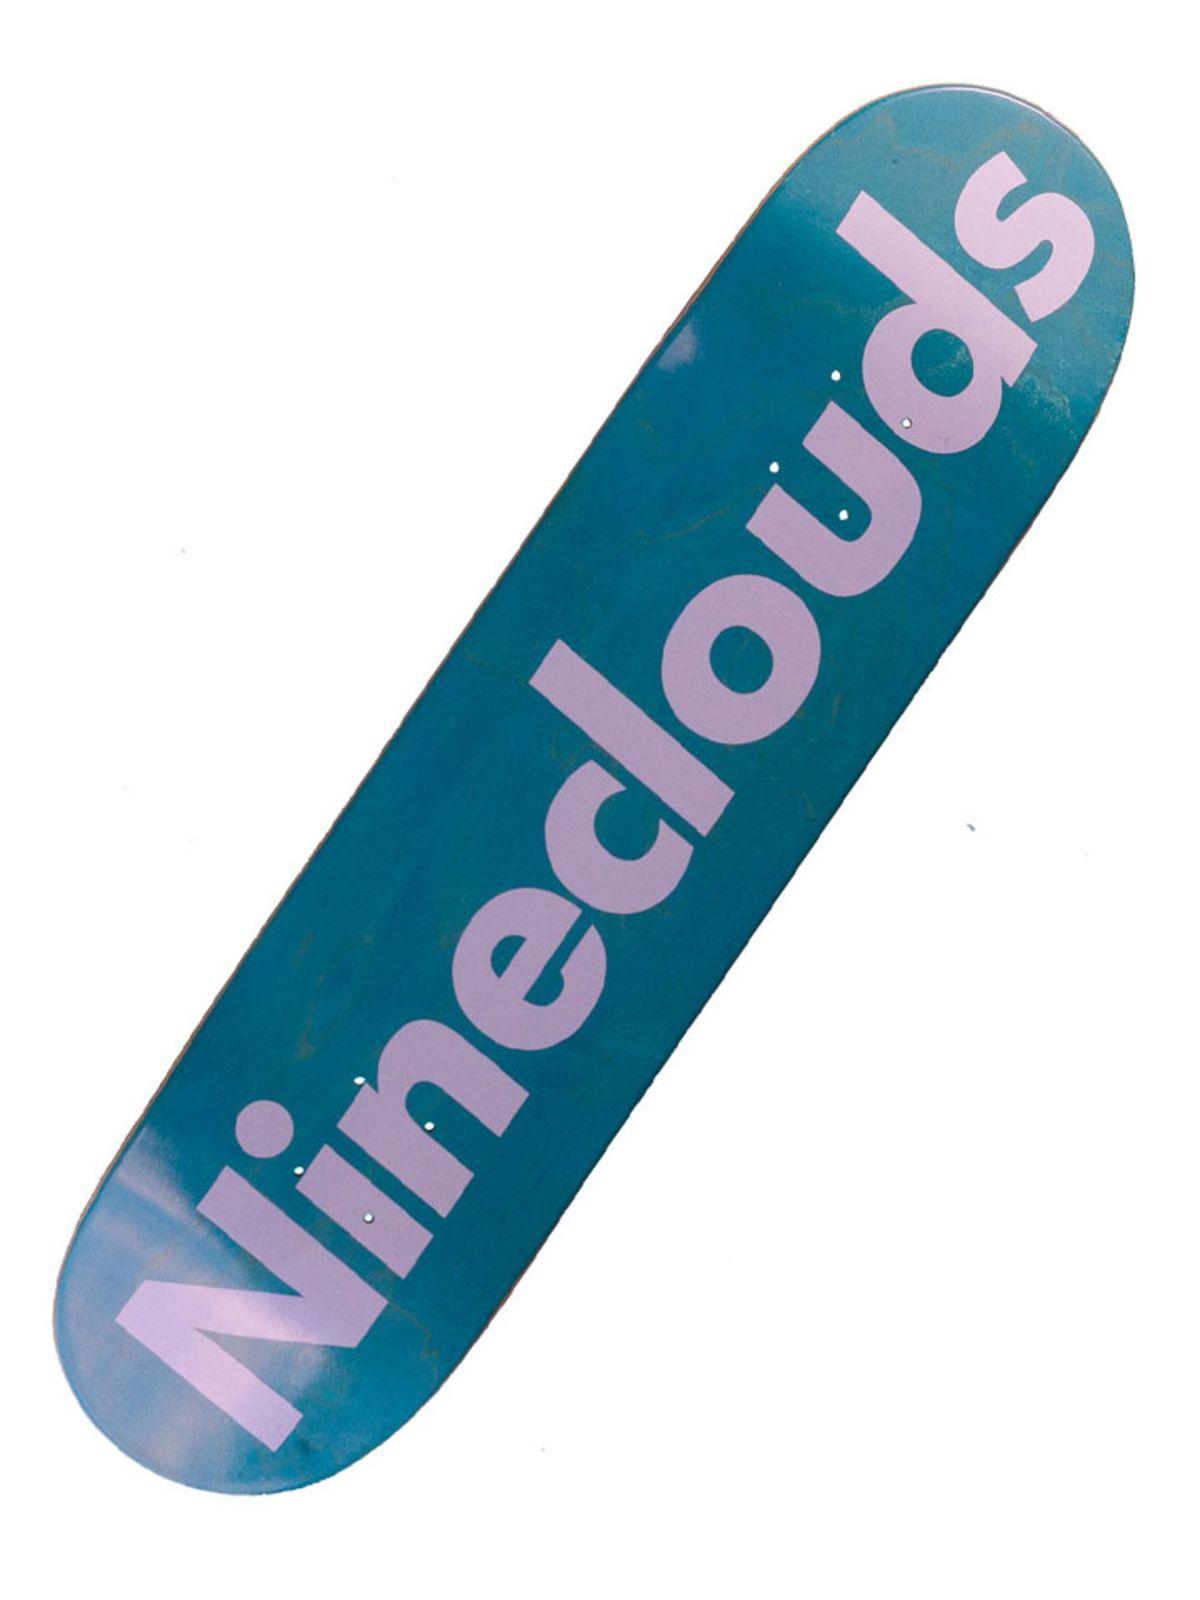 shape-nineclouds-9creme-va-blue-825-1-image